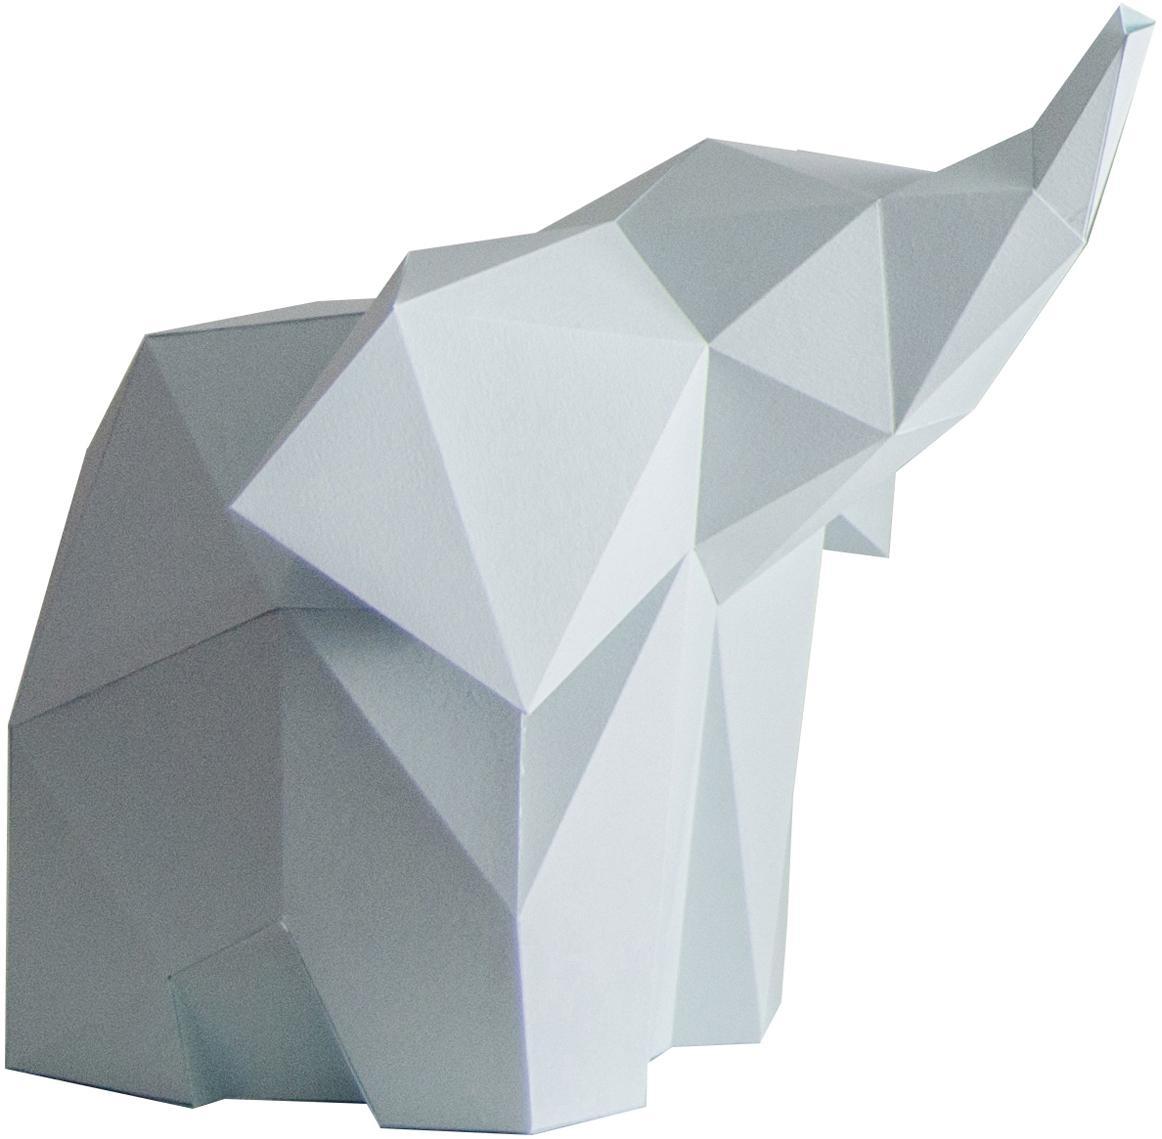 Lampada da tavolo in carta Baby Elephant, Paralume: carta, 160g/m², Azzurro, Larg. 23 x Alt. 24 cm